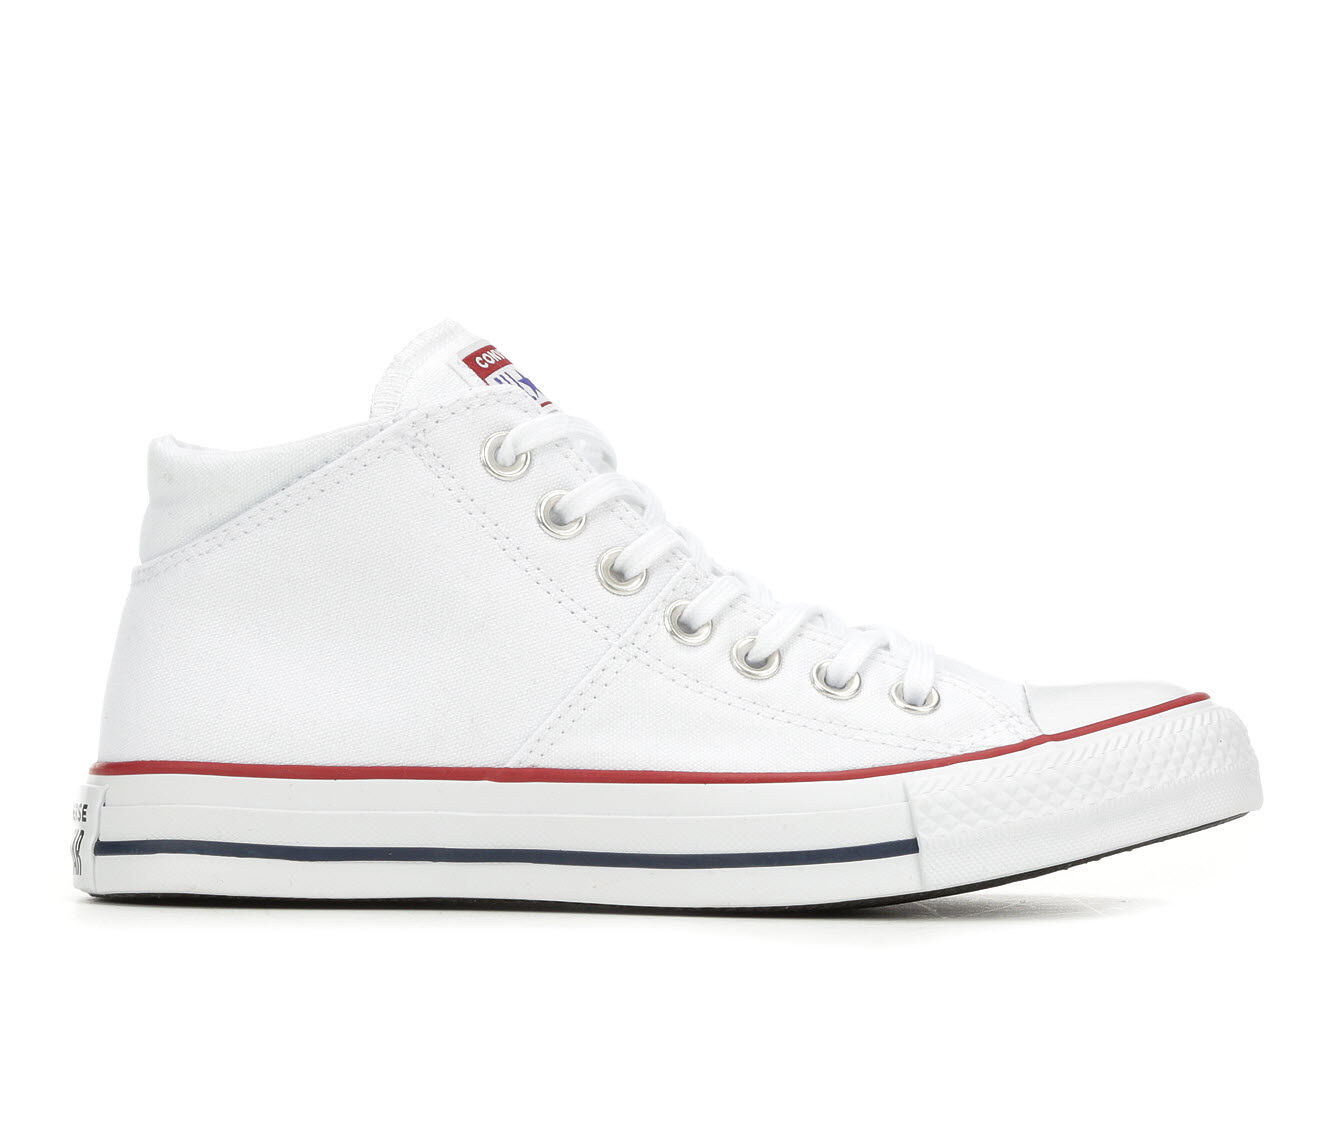 Women's Converse Madison Mid Sneakers White/White